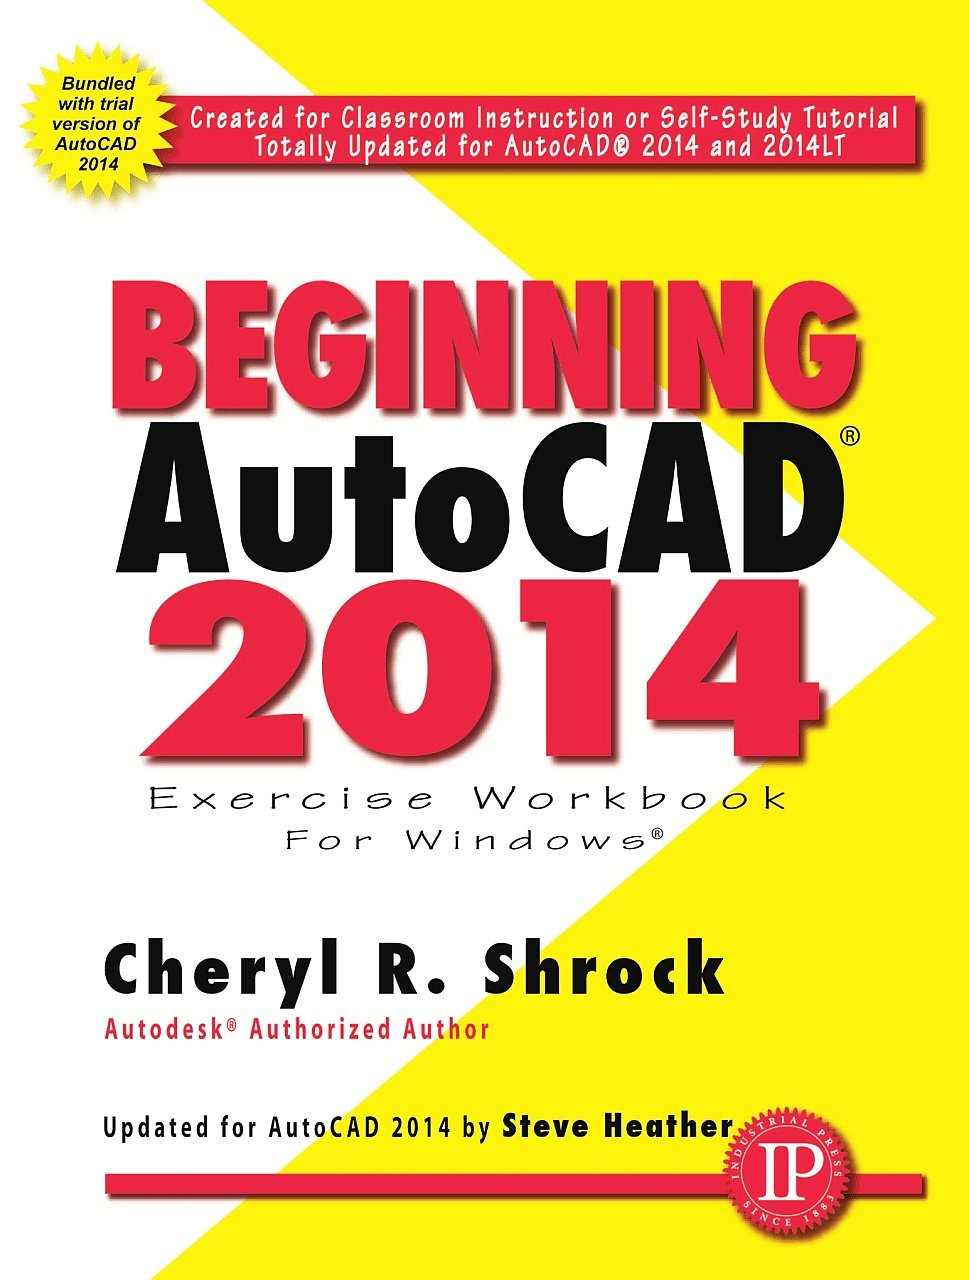 Beginning autocad 2014 cheryl r shrock 9780831134730 amazon beginning autocad 2014 cheryl r shrock 9780831134730 amazon books baditri Images